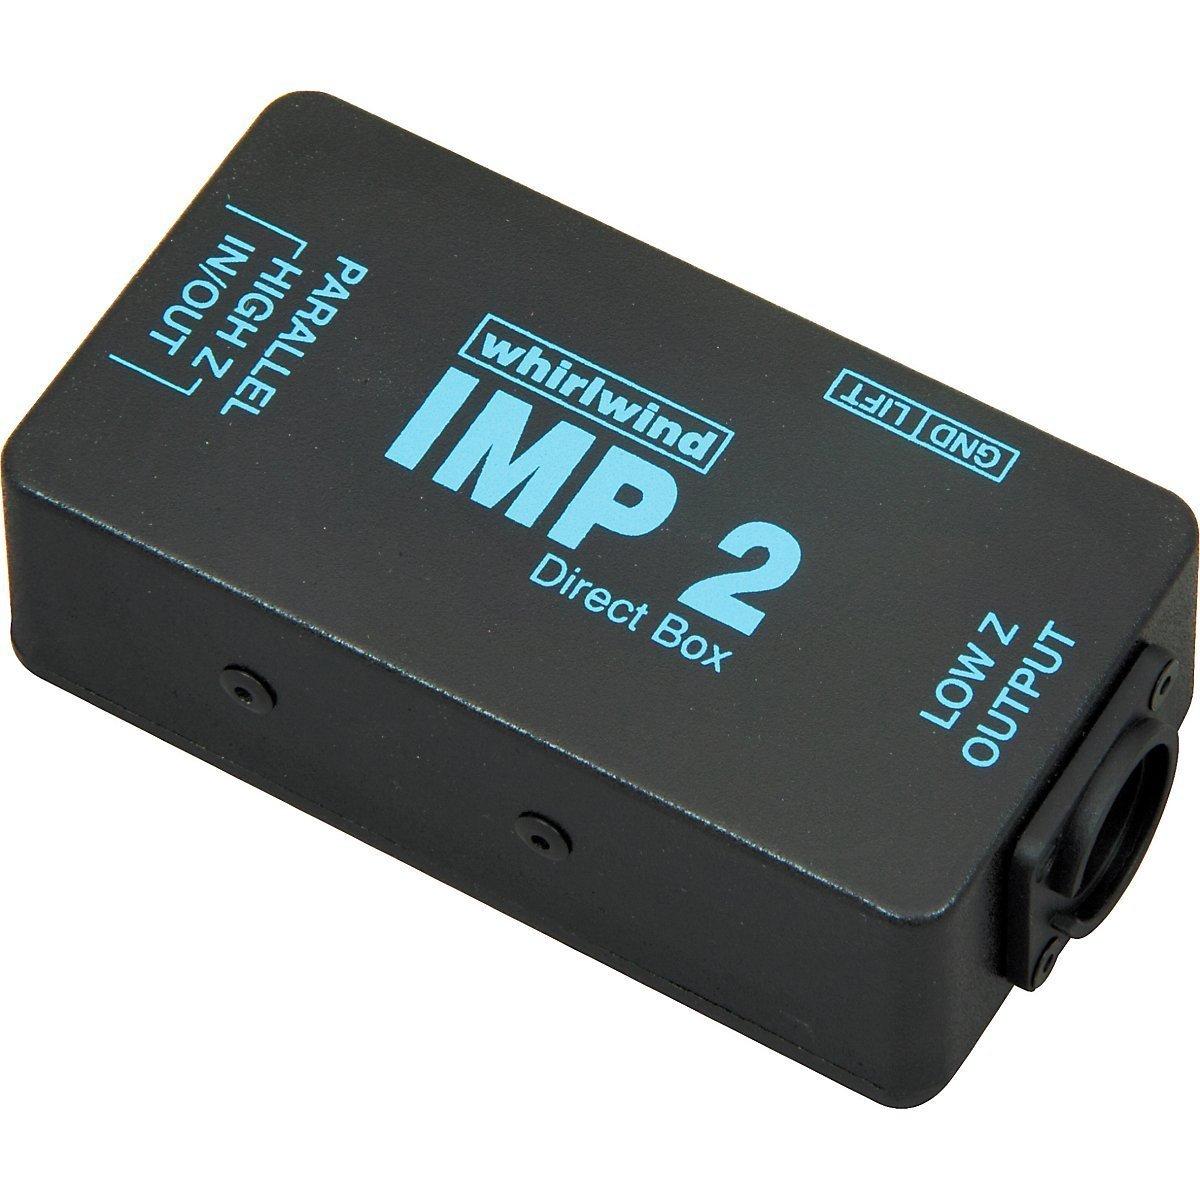 WhirlwindIMP 2 Standard Direct Box